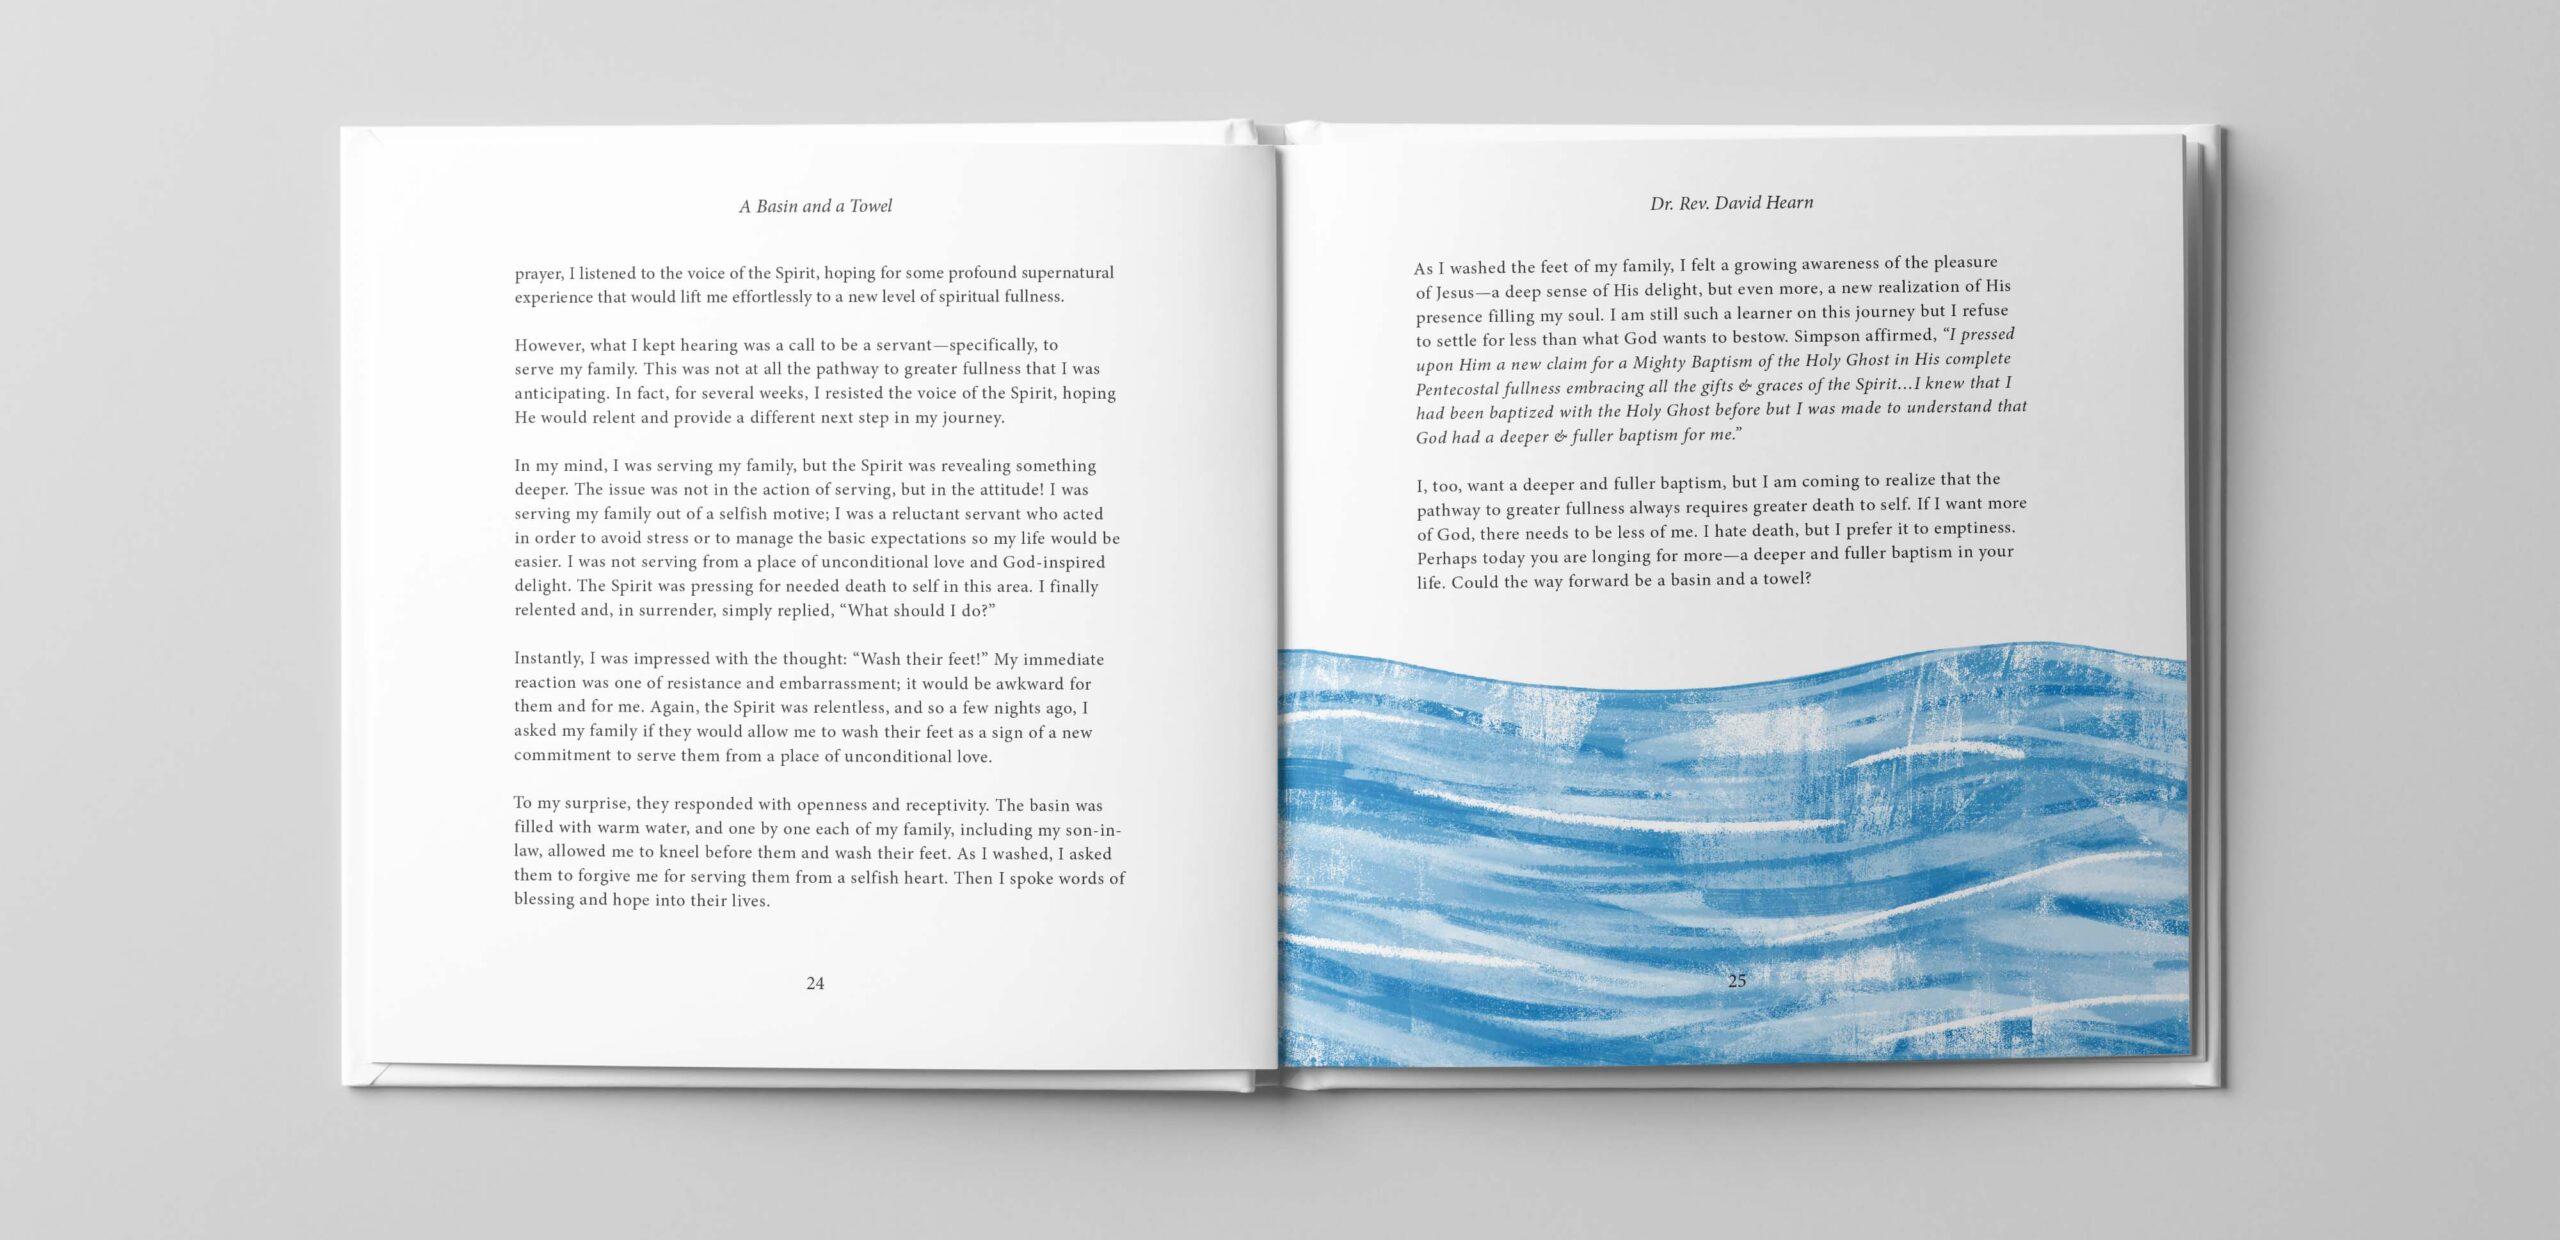 Illustration of water